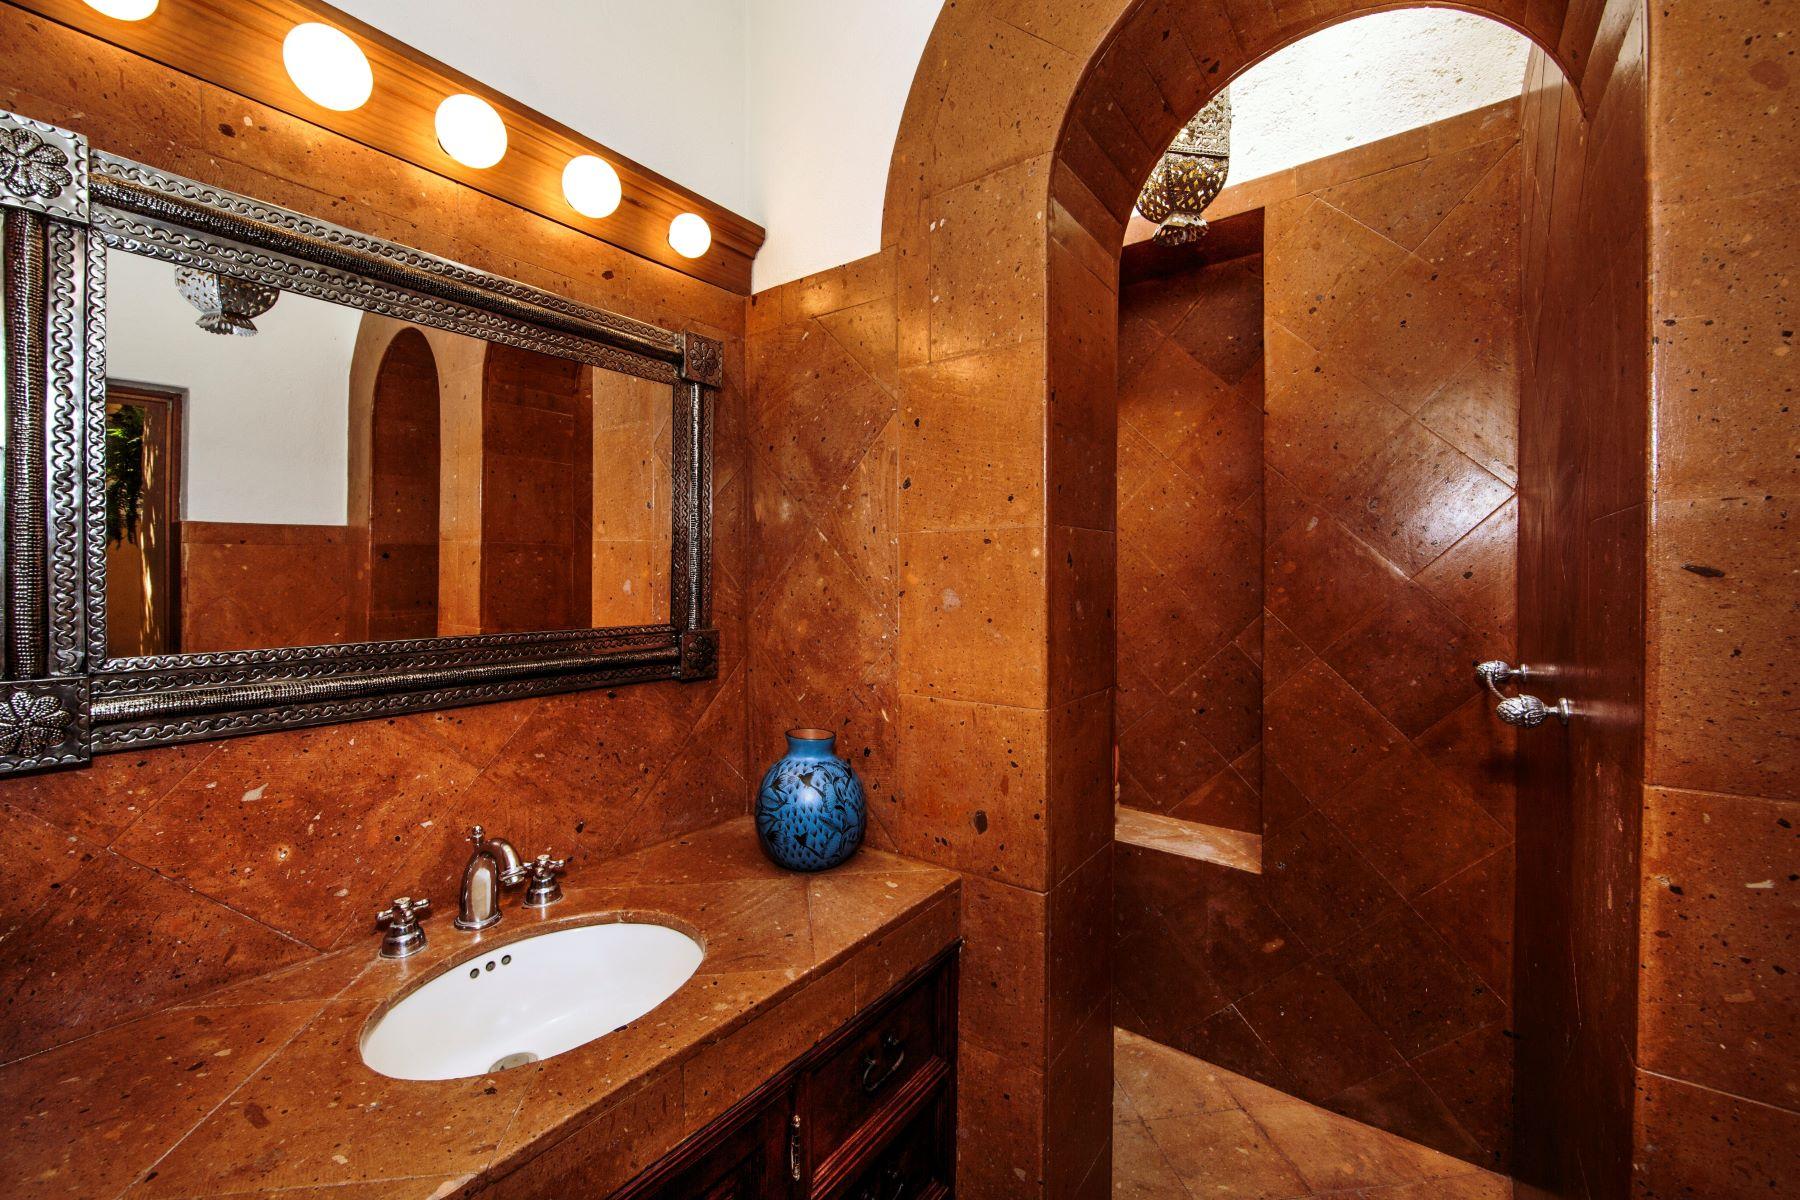 Additional photo for property listing at Casa Barranca Barranca 18 San Miguel De Allende, Guanajuato 37700 México